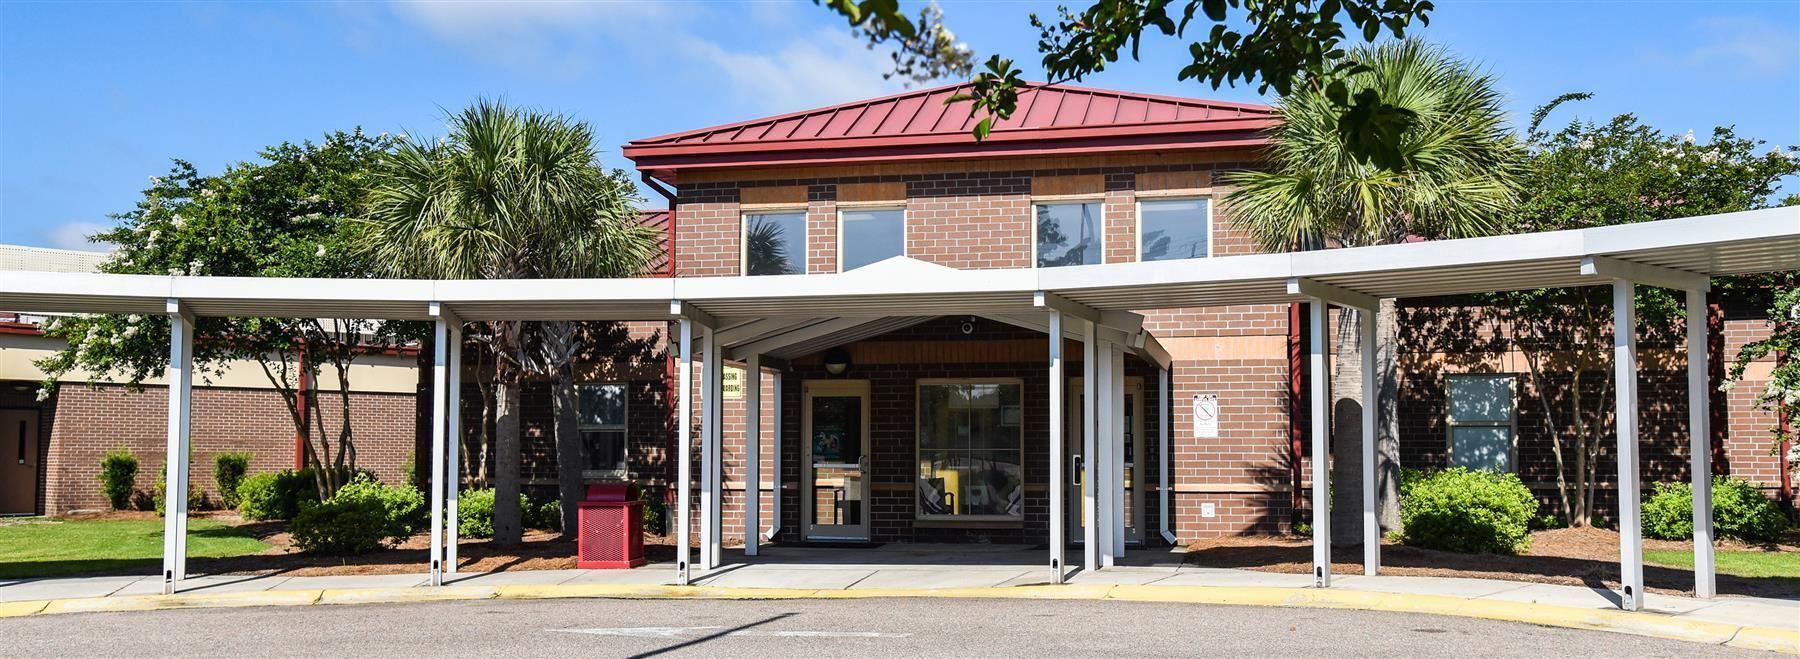 109 Sweet Cherry Lane Summerville, SC 29486